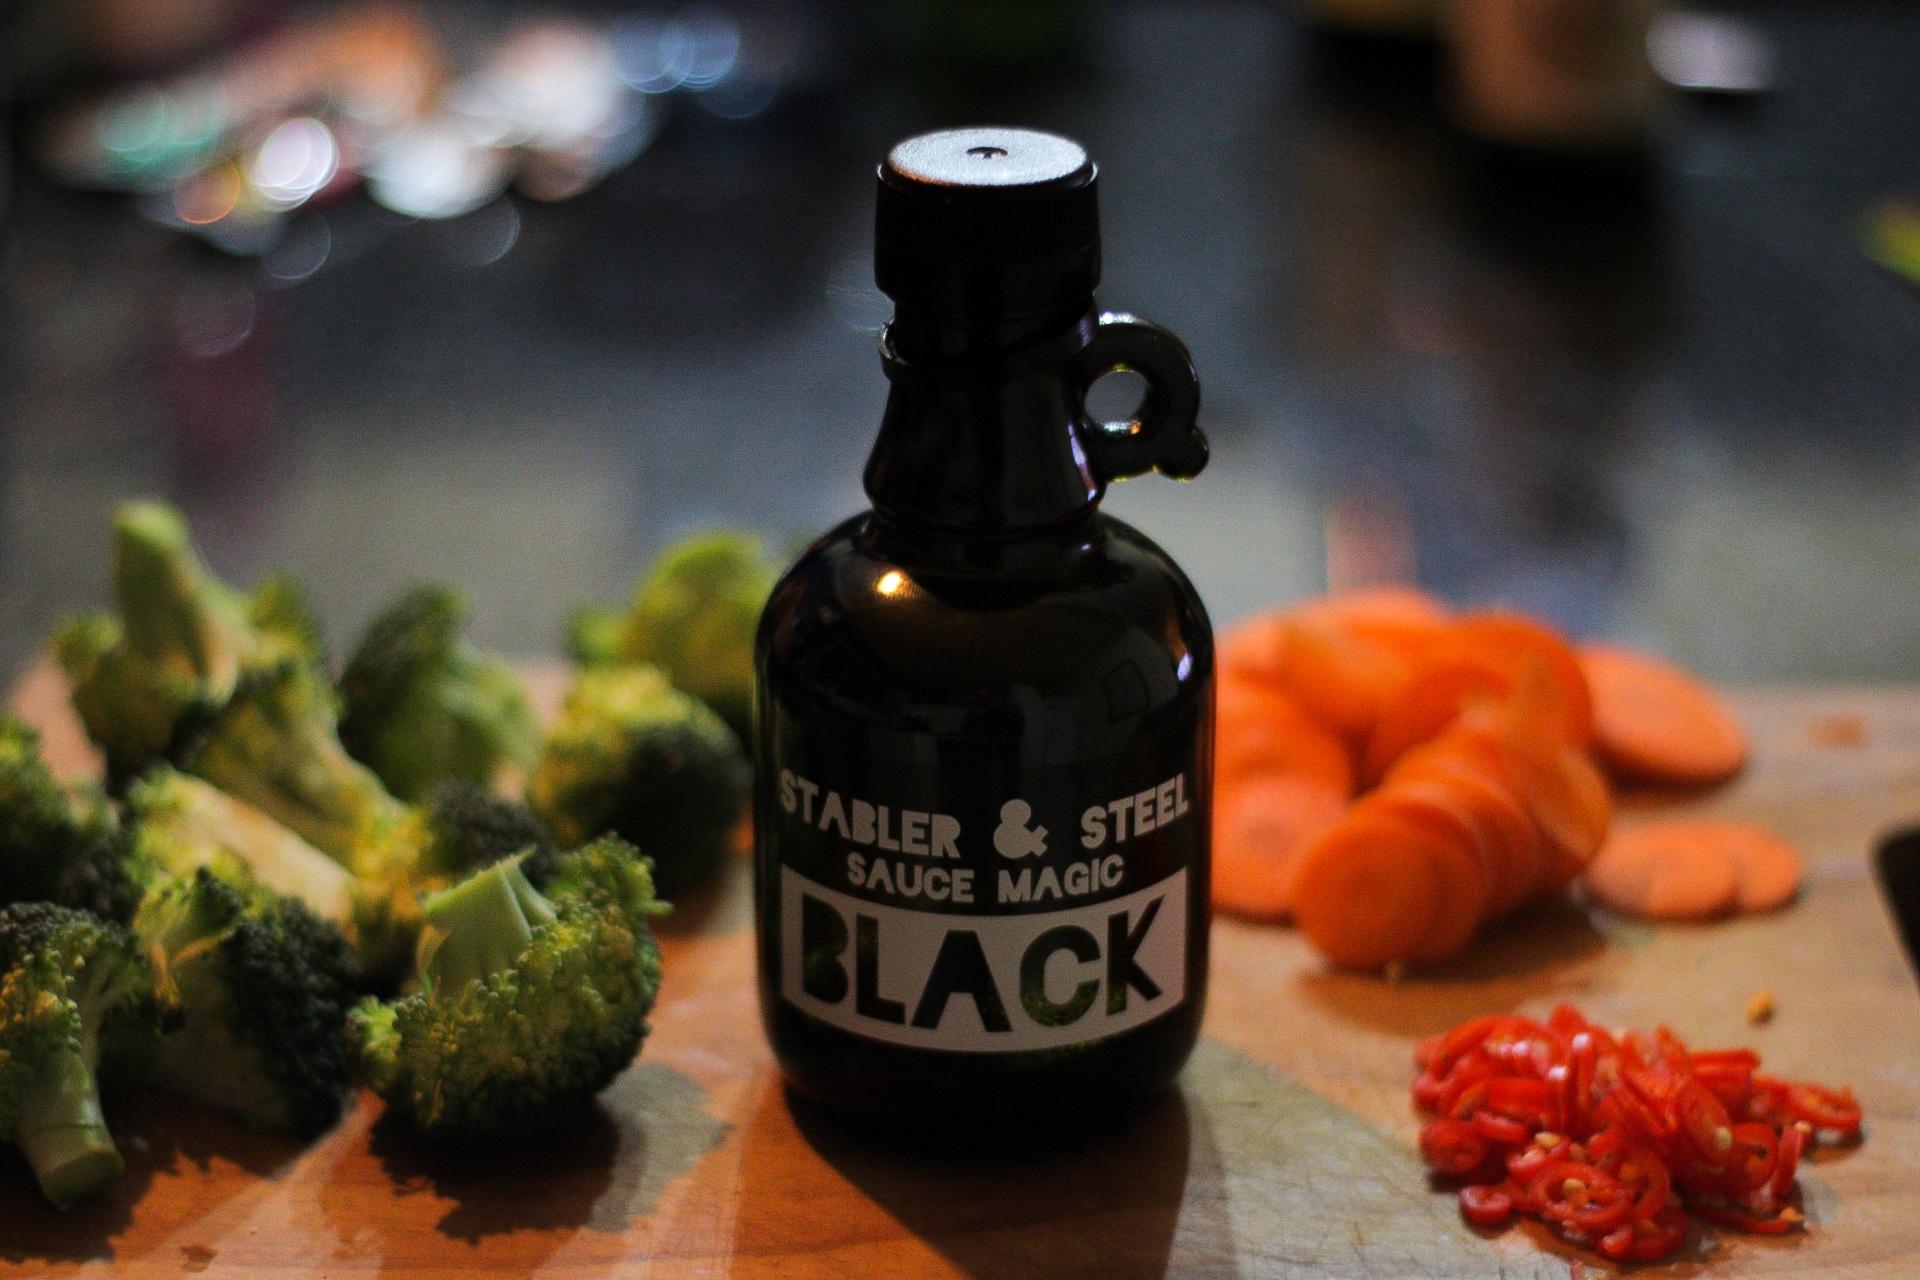 Black_05.jpg